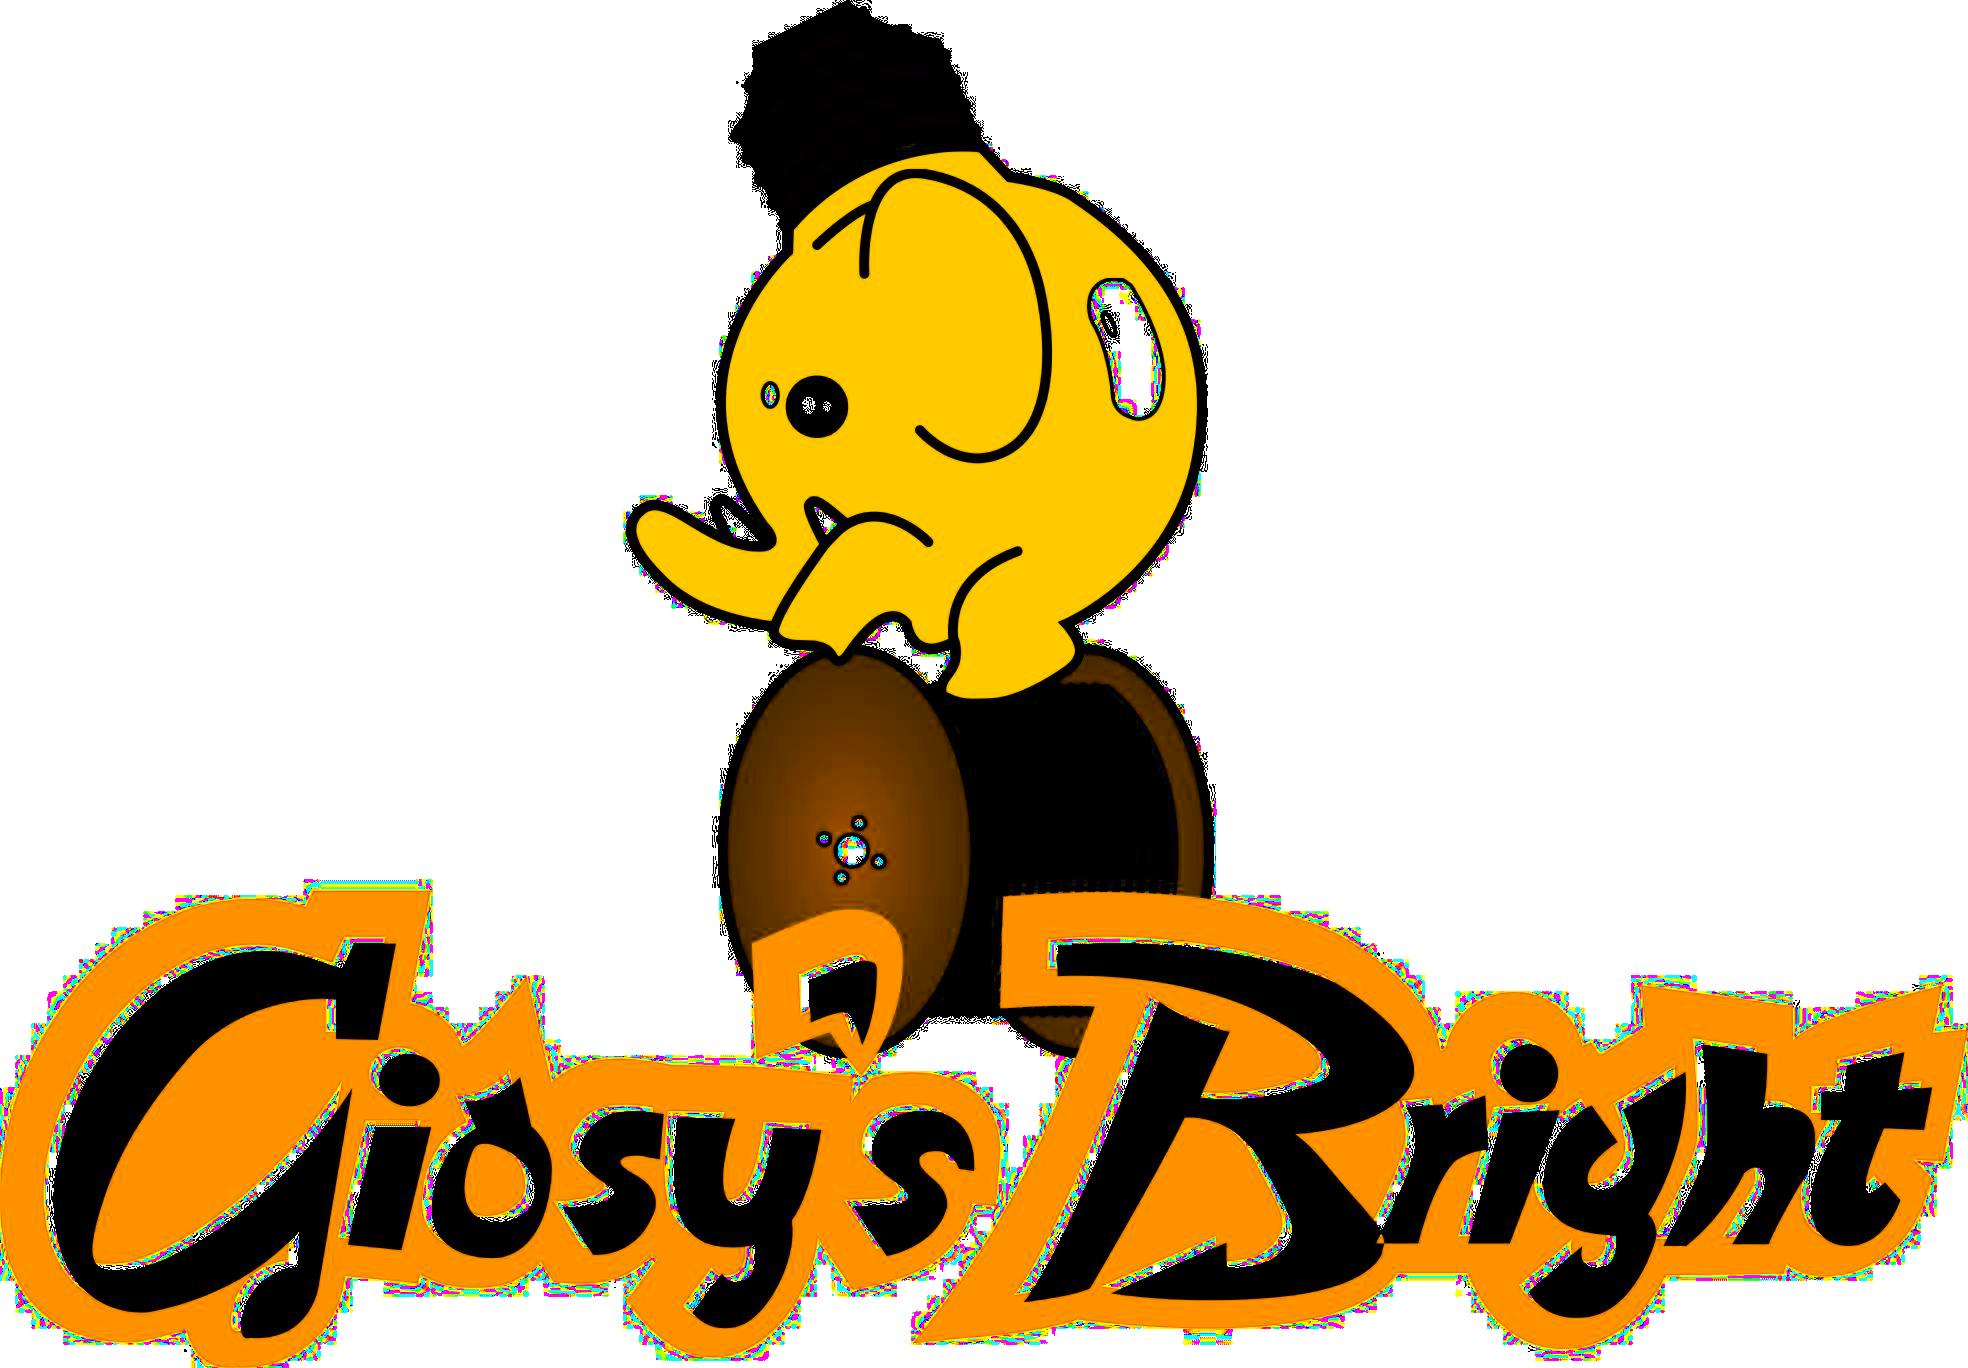 Giosy's Bright Srl